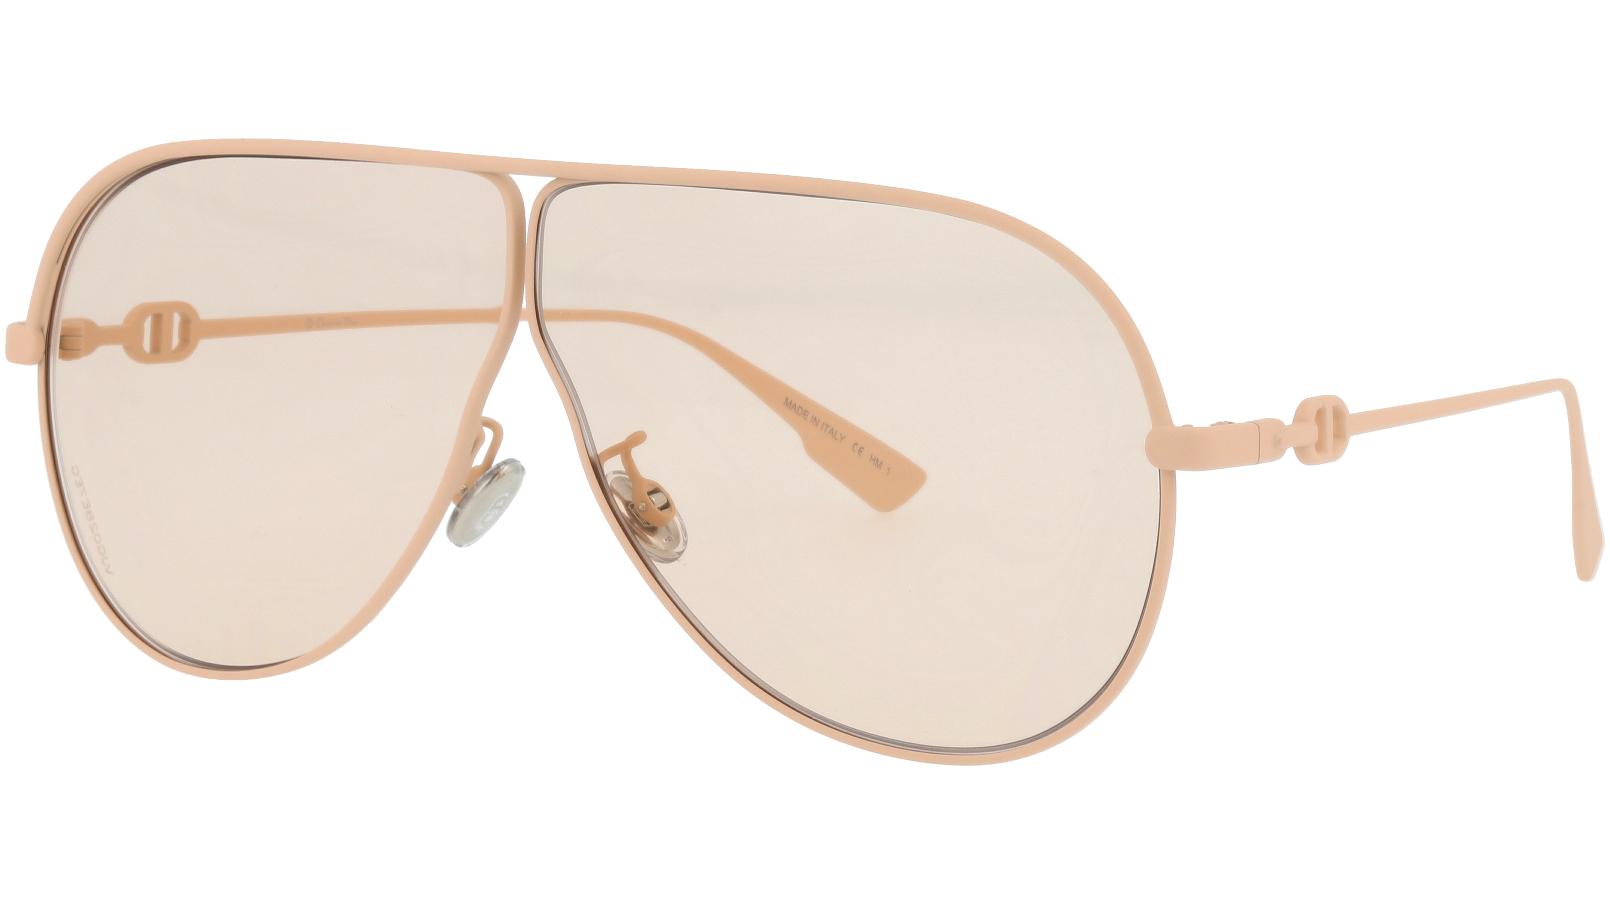 Dior CAMP V1VVC 66 Nude Sunglasses